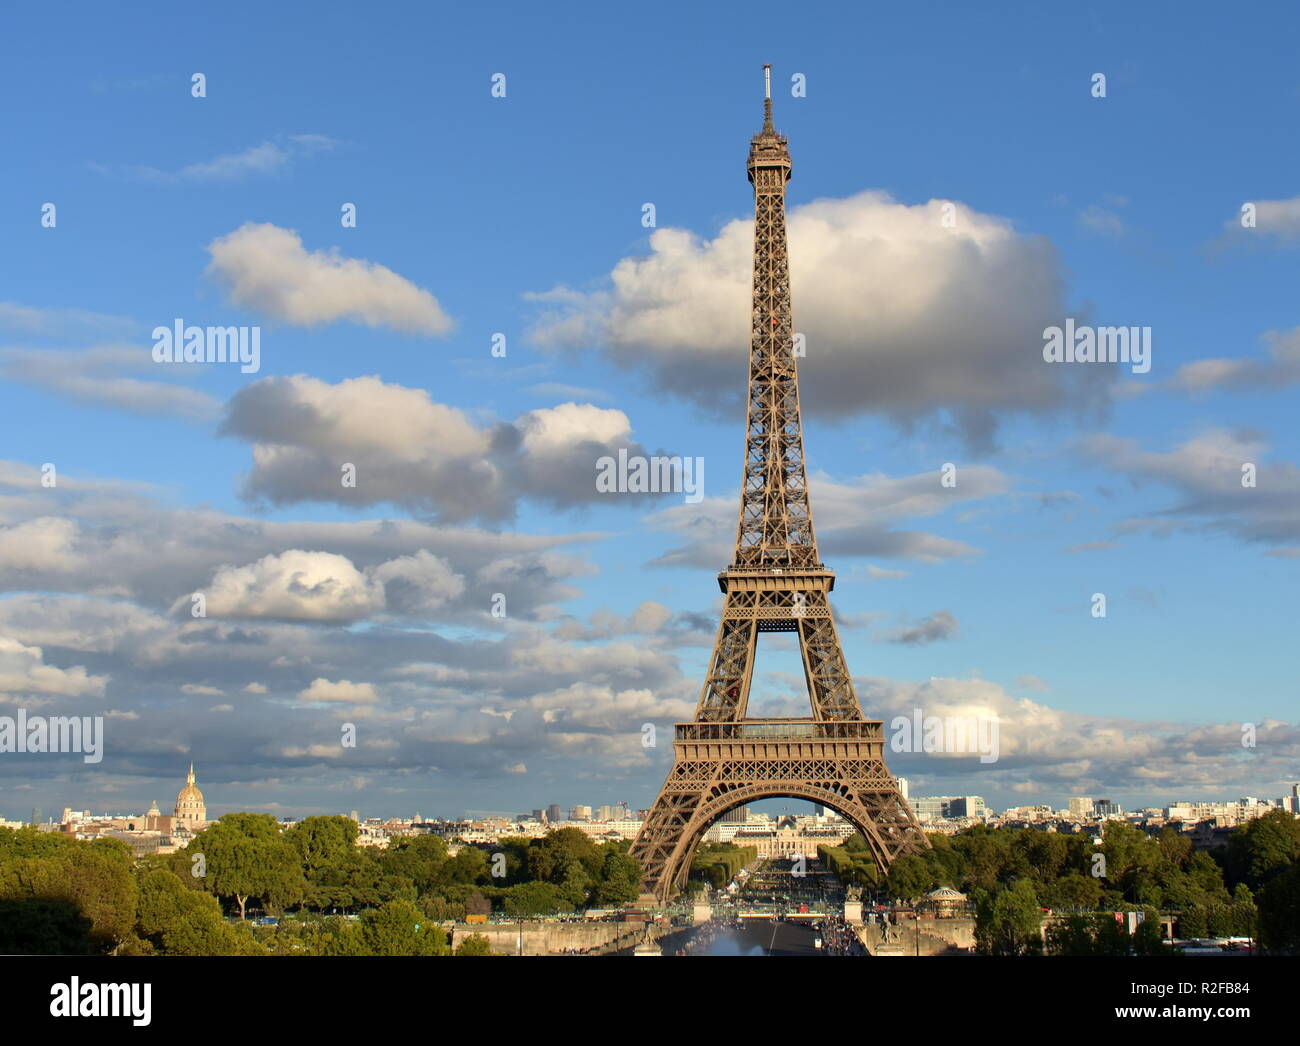 Paris. Eiffel Tower from Trocadero. Rainy day, sunset. - Stock Image